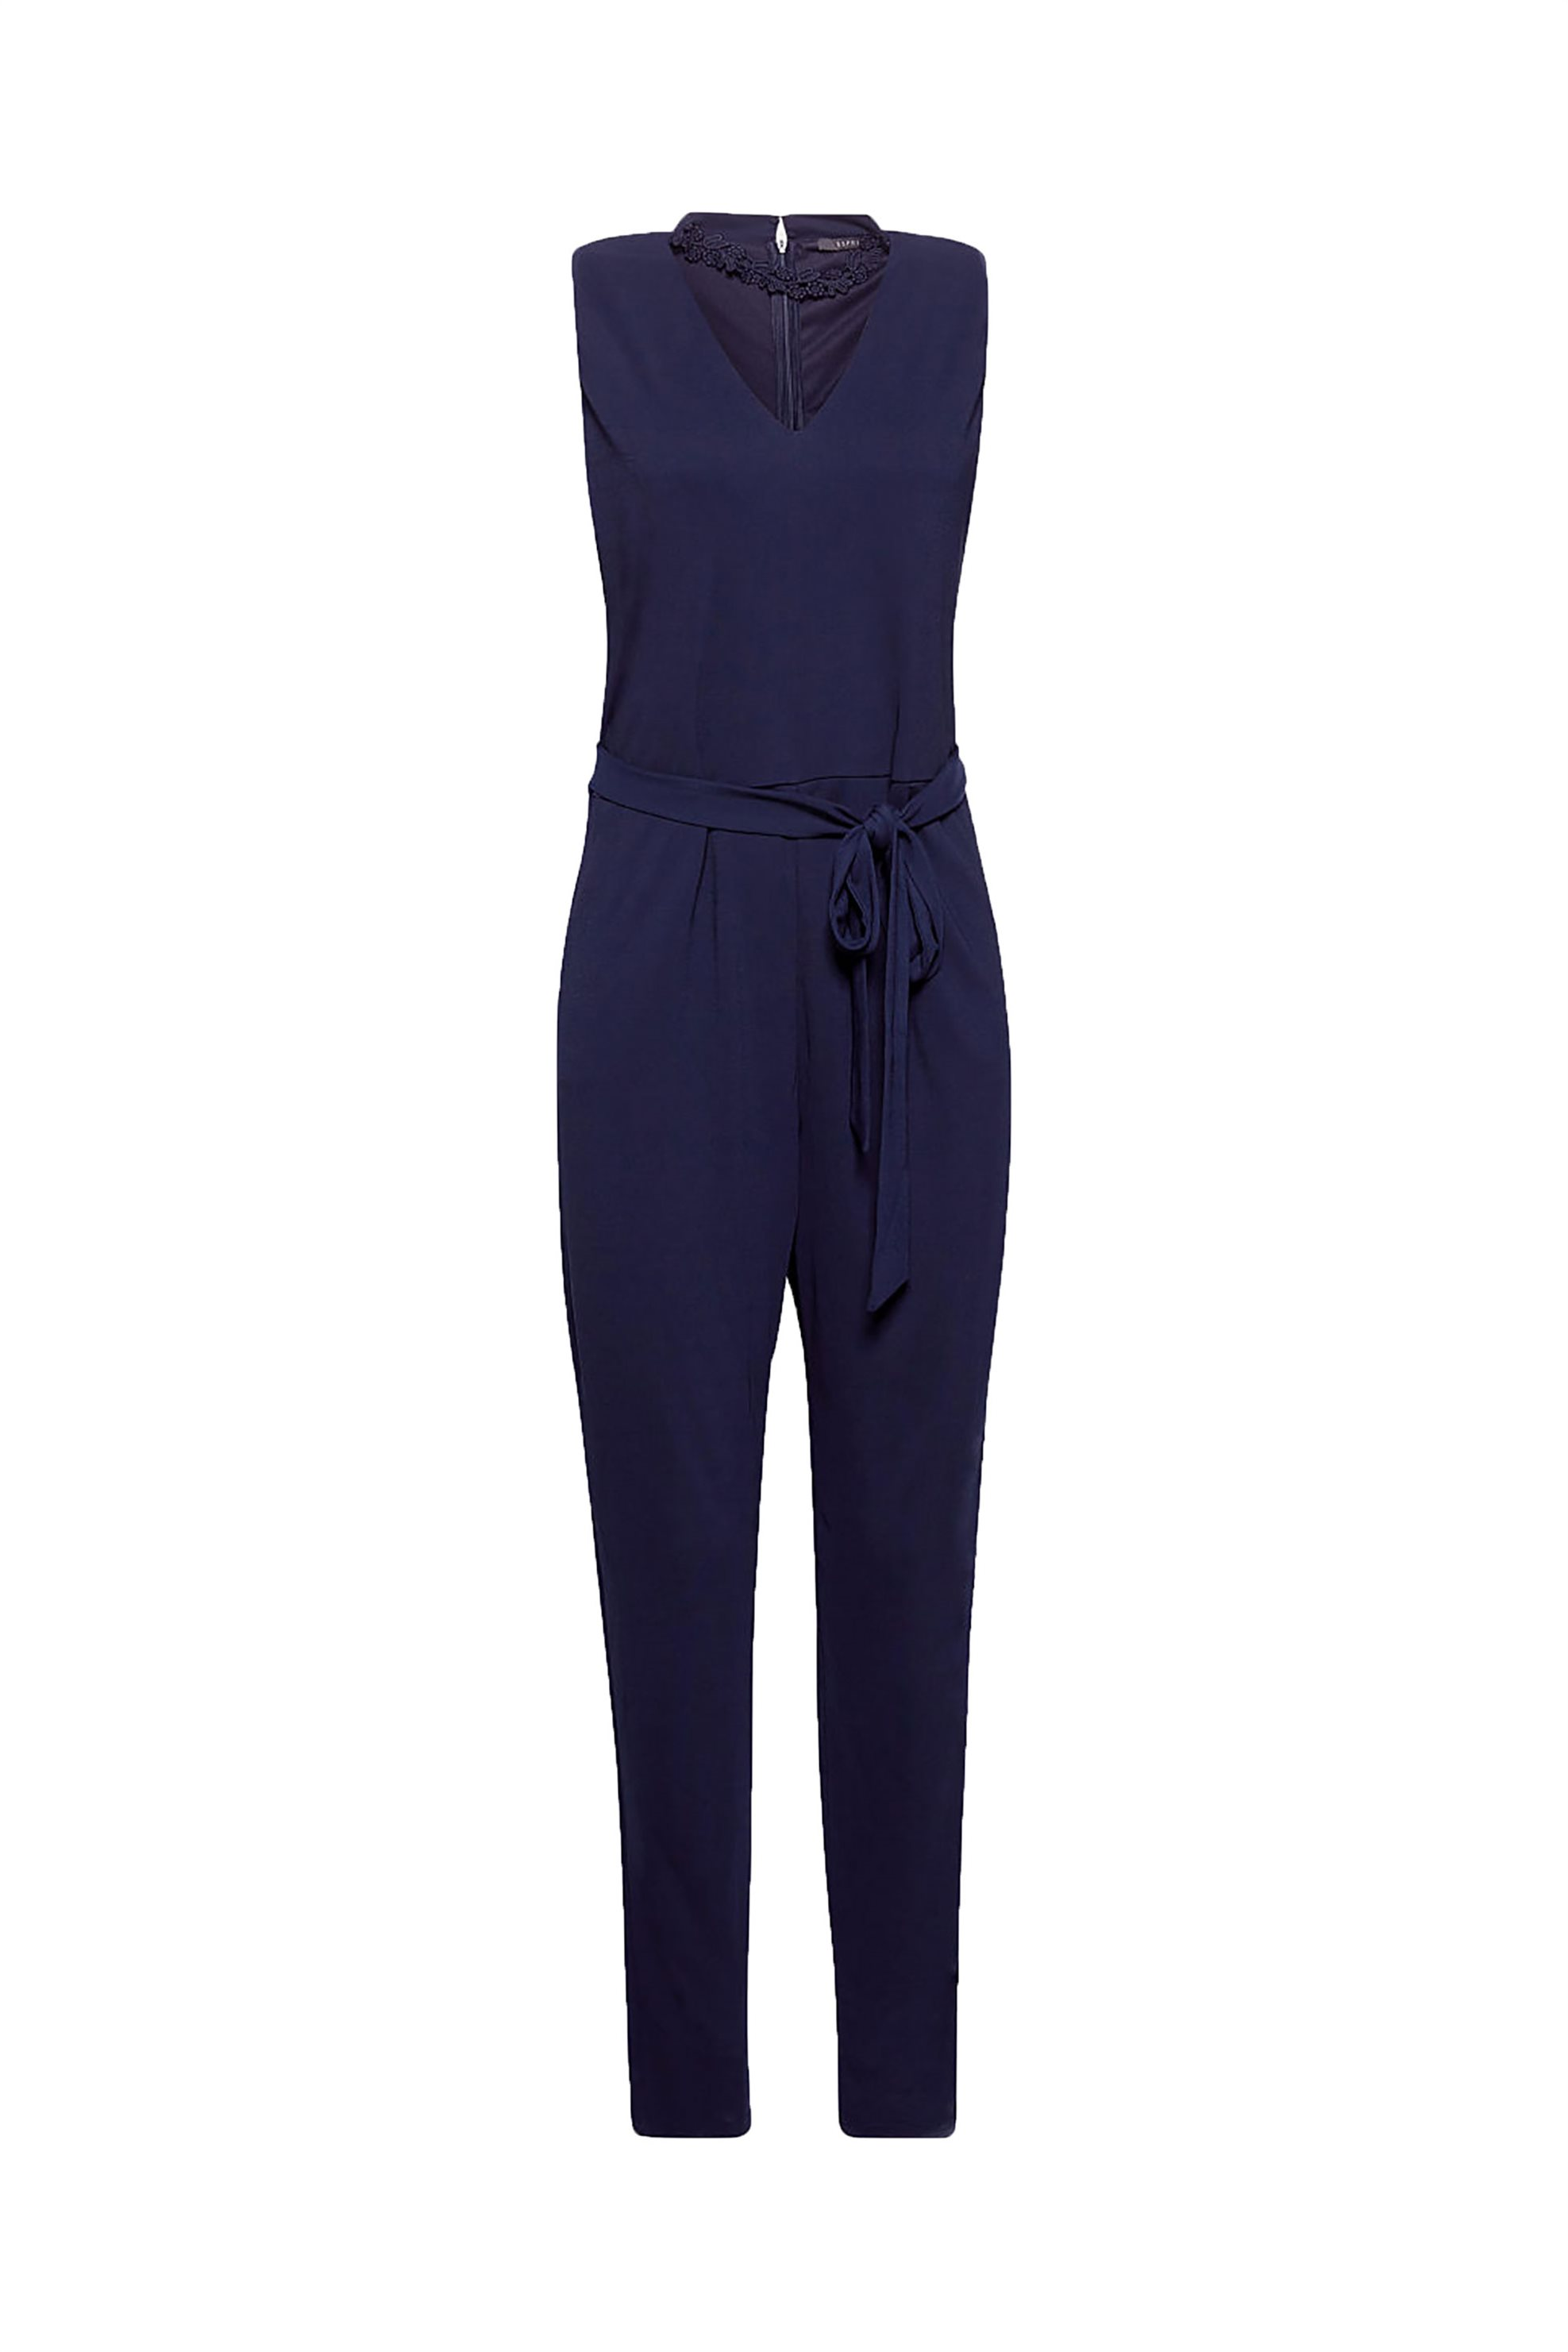 Esprit γυναικεία ολόσωμη φόρμα με δαντέλα - 088EO1L001 - Μπλε Σκούρο γυναικα   ρουχα   ολόσωμες φόρμες   σαλοπέτες